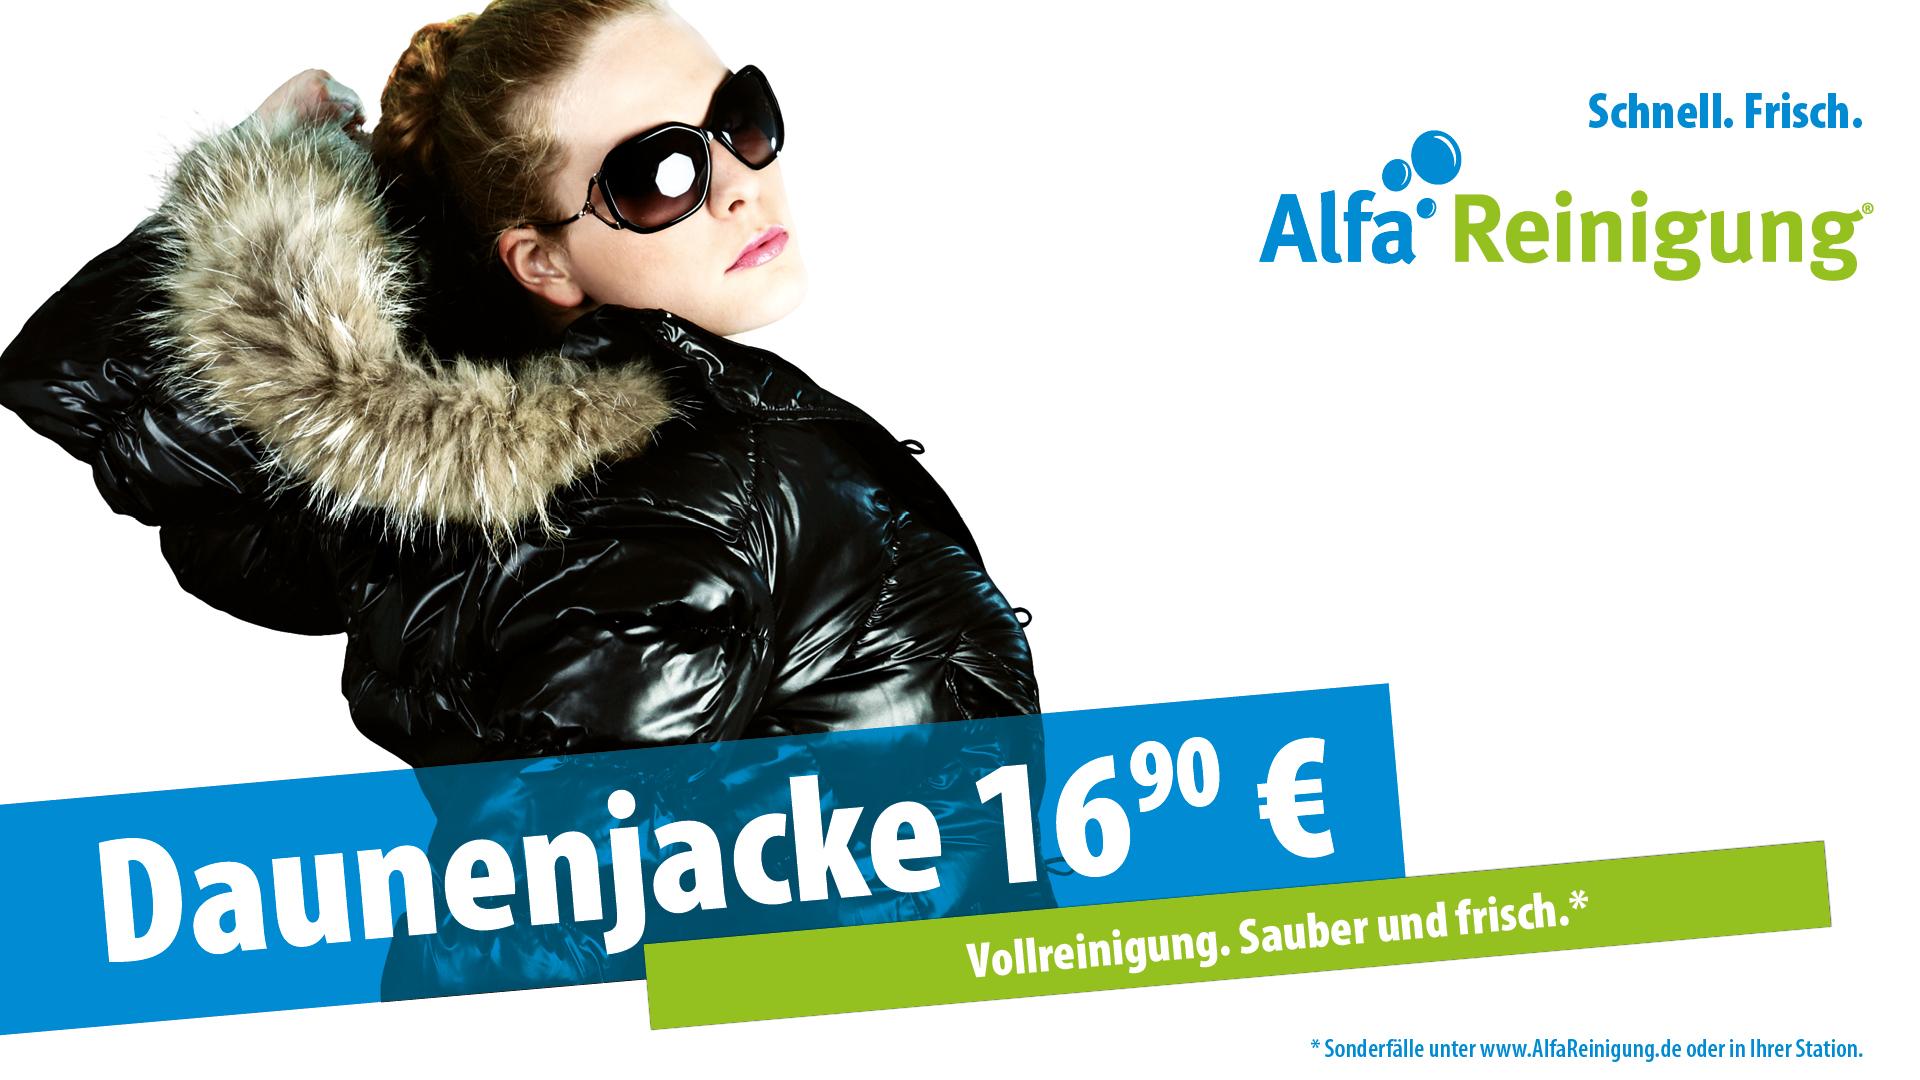 ALF-Screen-Daunenjacke1690